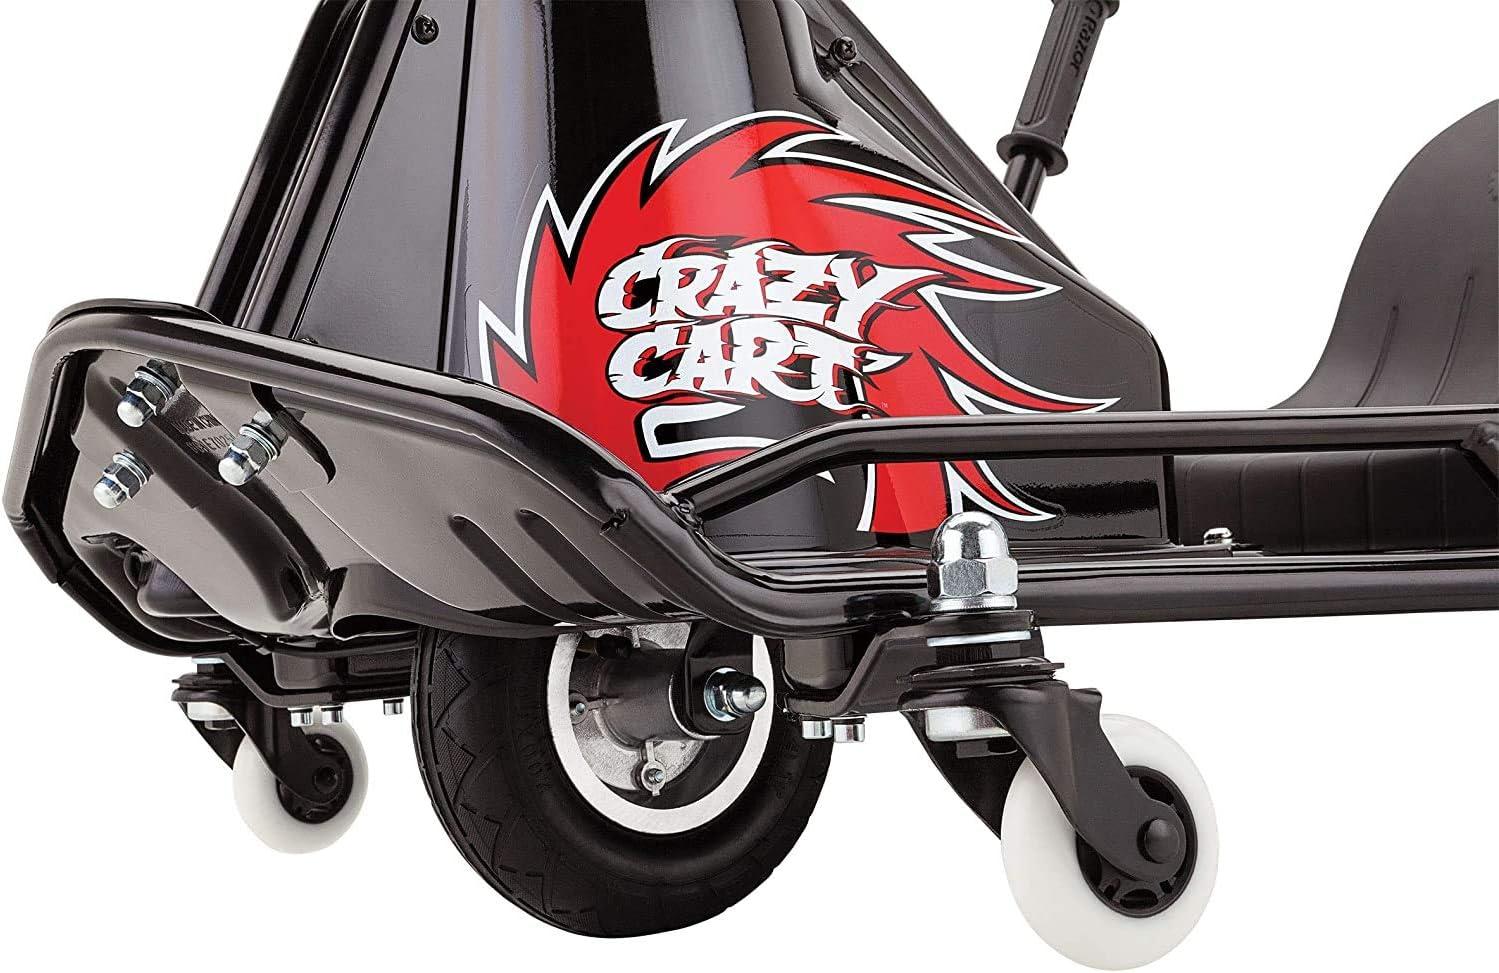 2 Crazy Cart Dune Buggy - Premium RAZOR Scooter Tire Tube for E100 8x2 Angle Valve Tube A5 Air E200 OEM Replacement Part W13112099045-8 tube 200x50 Inner Tube Razor E1//E2 2 Pack